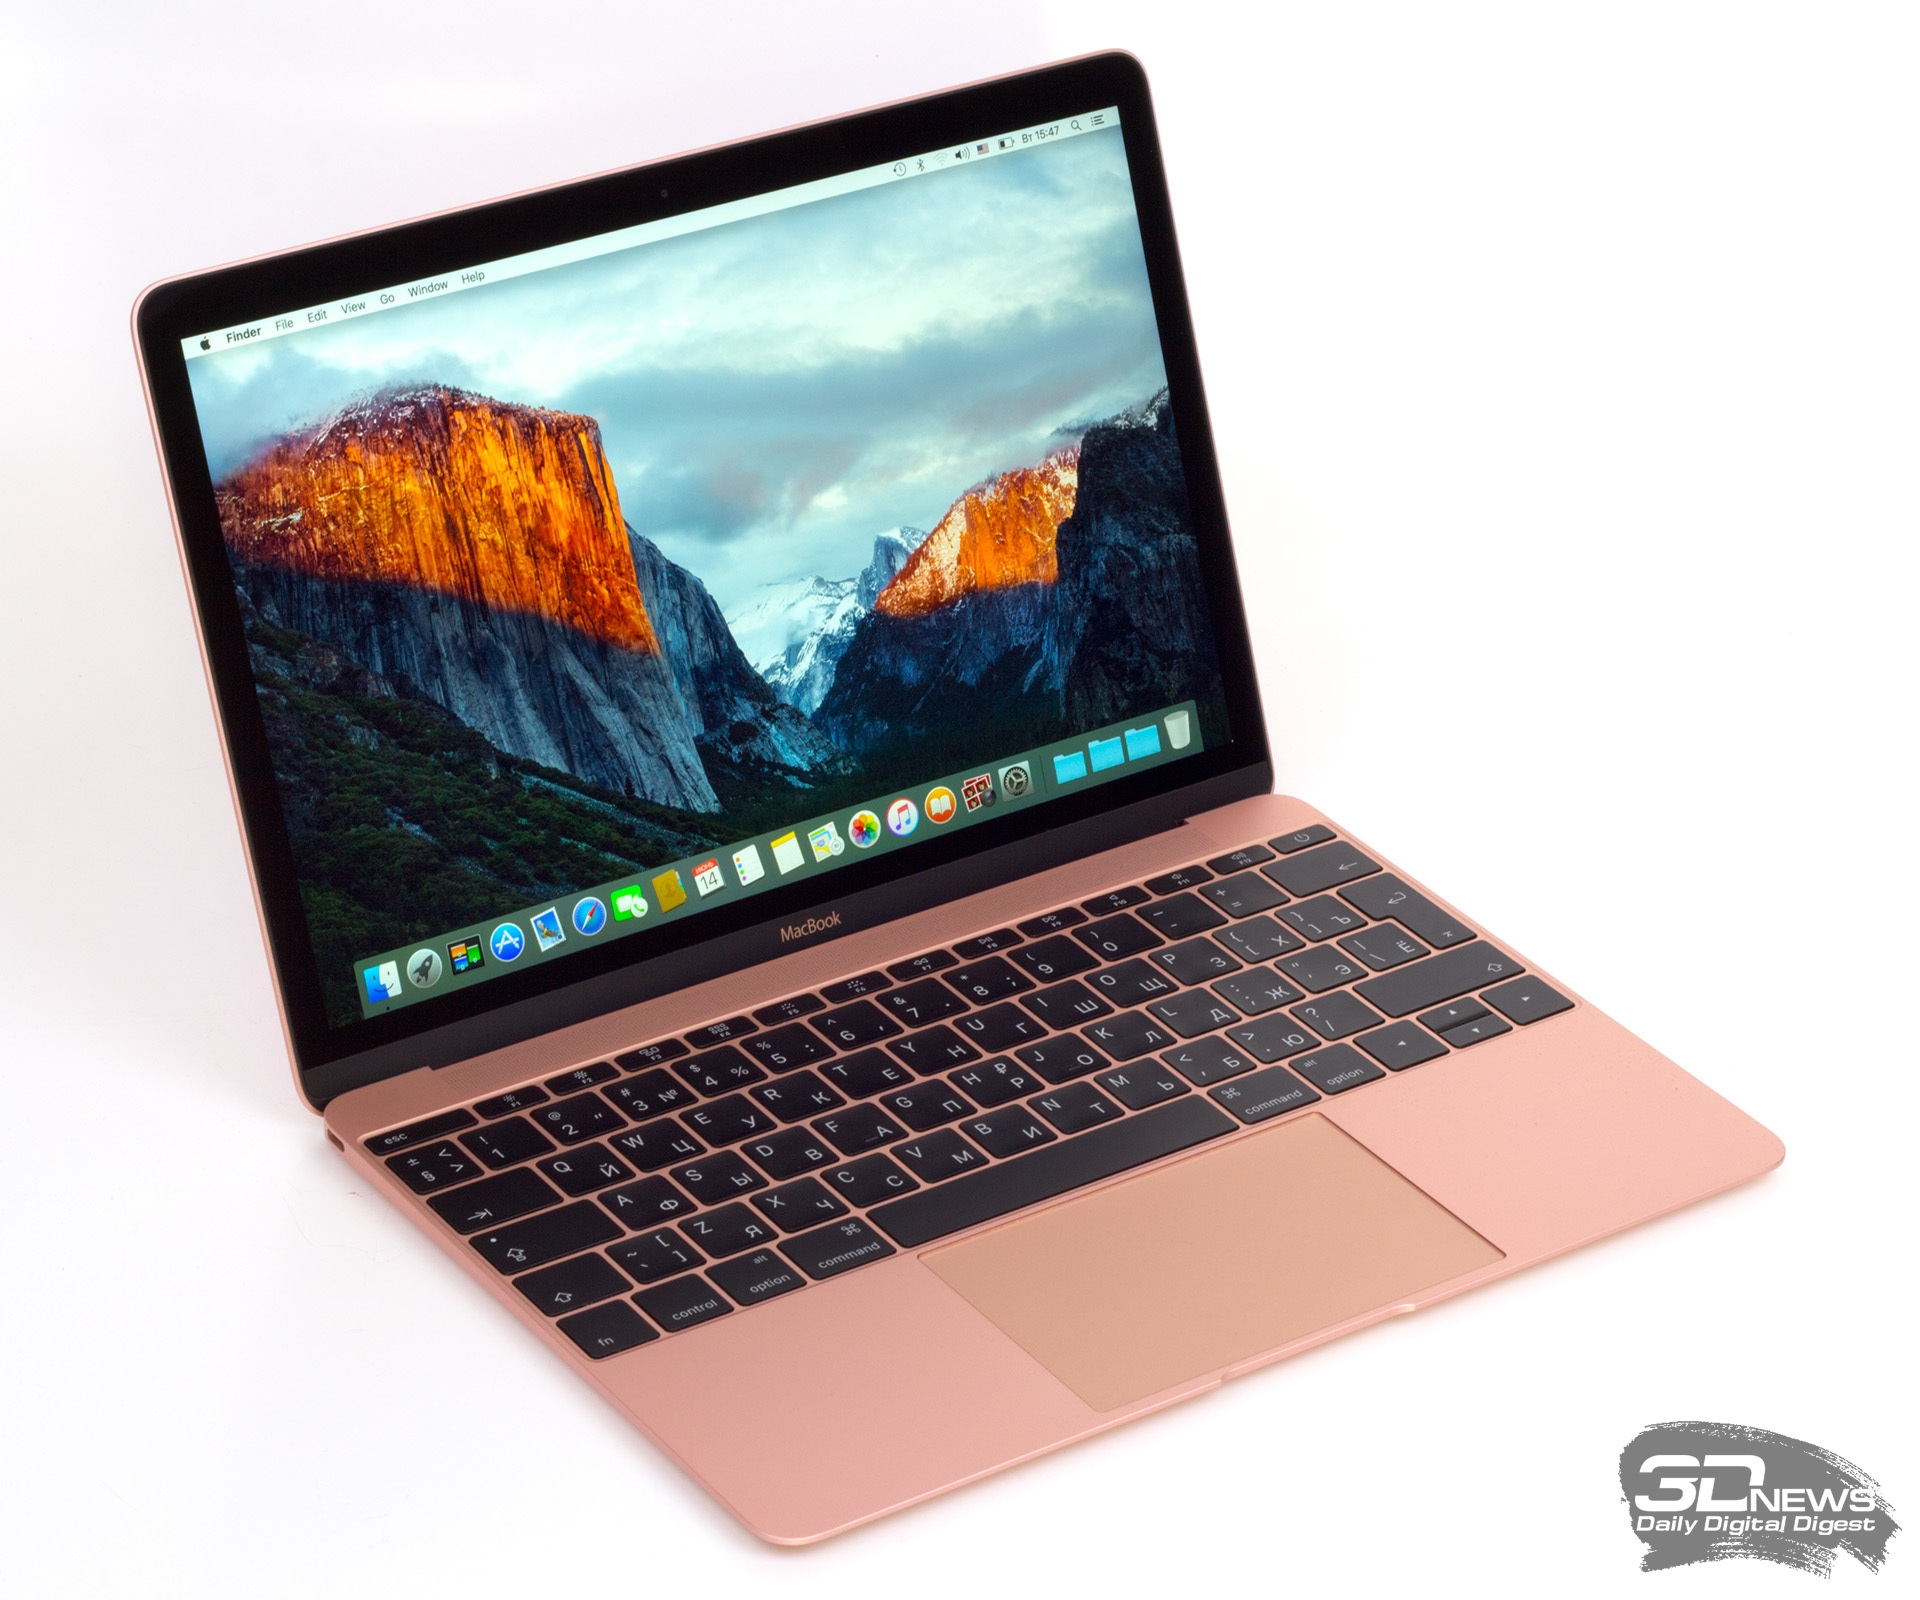 Harga Jual Apple Macbook Mk4n2 Notebook Gold Intel Core M 8gb 512gb Mlhf2 M5 12inch New 2016 Mlhe2 12 Inch Gold3 Daftar Terkini